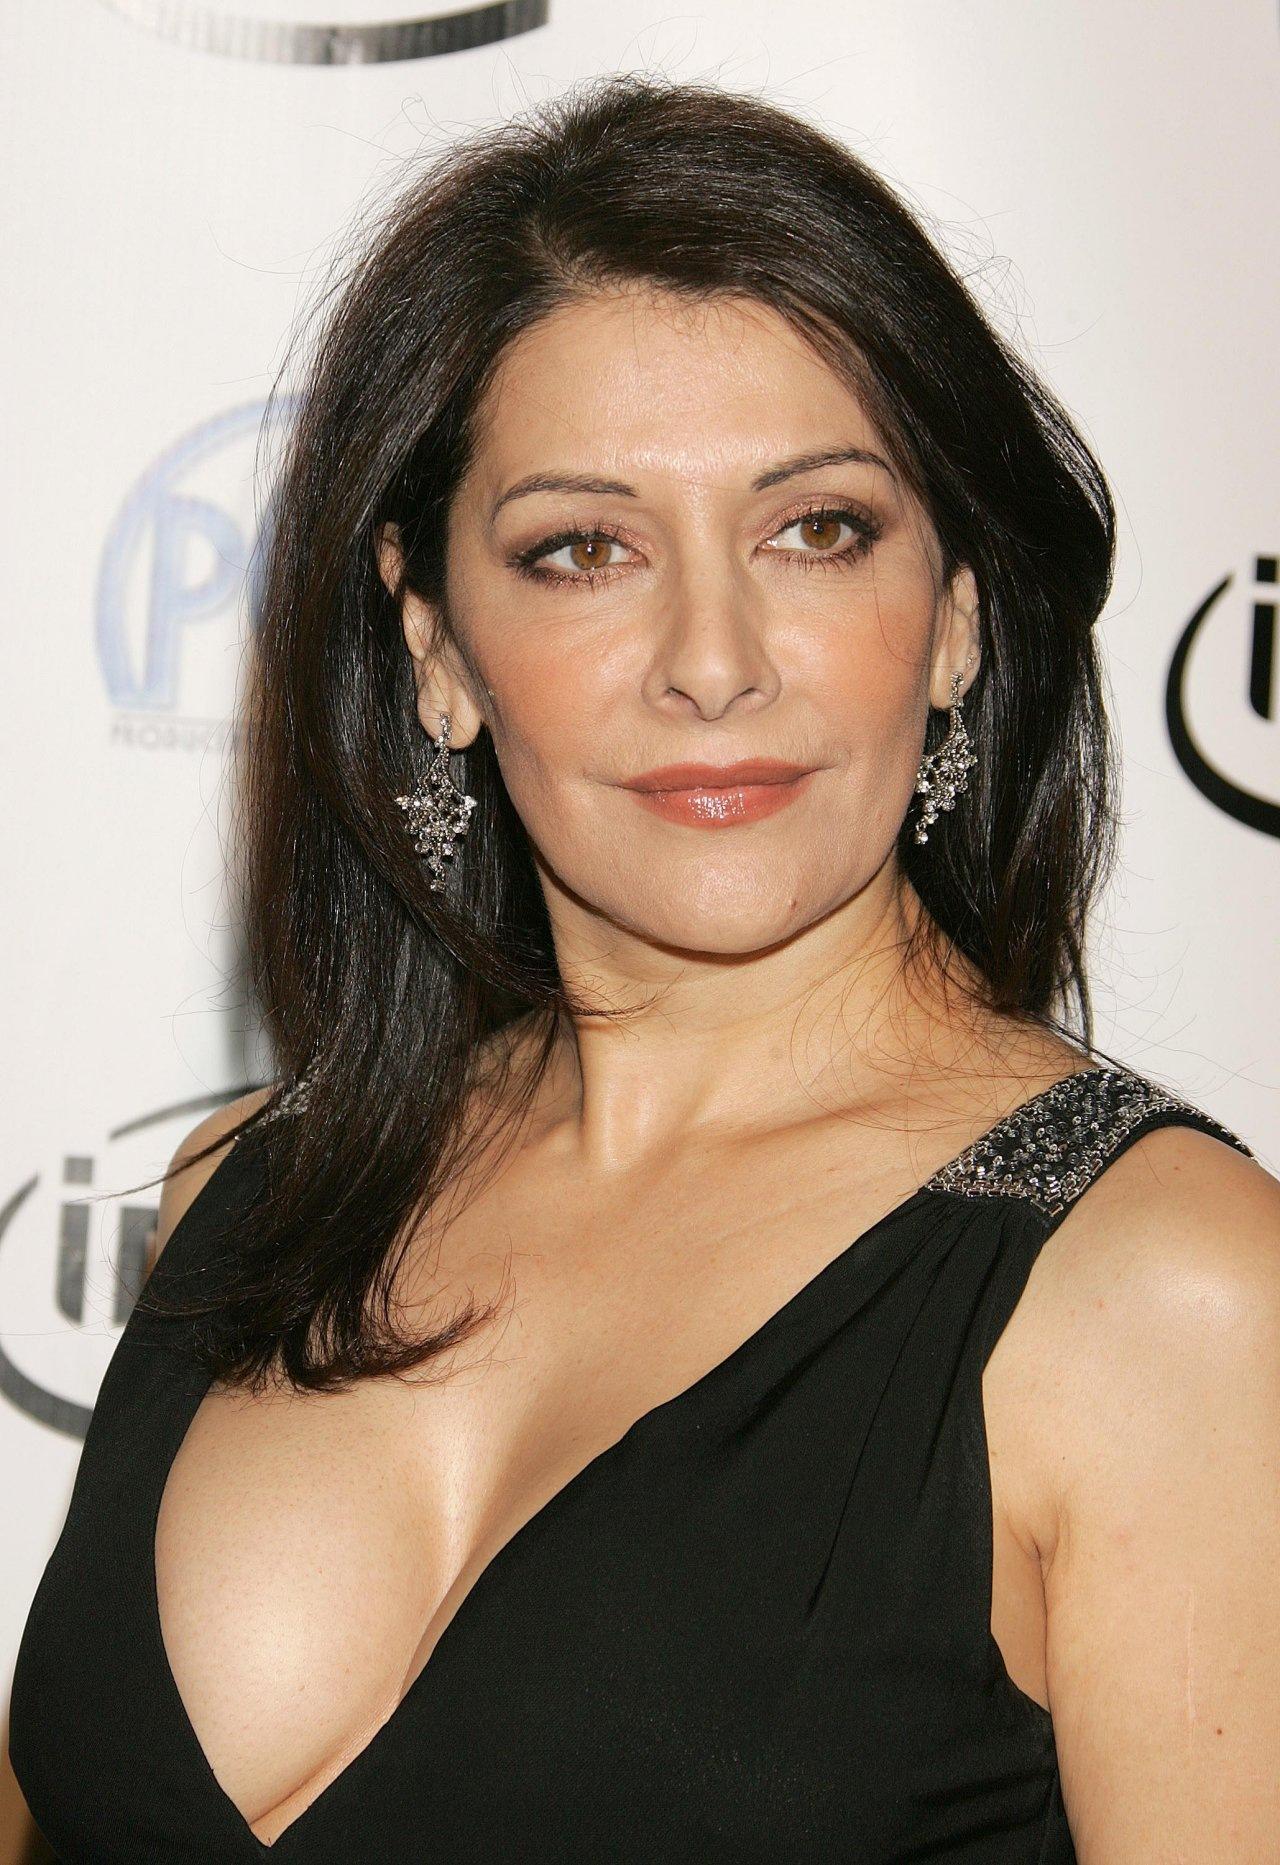 http://images.wikia.com/headhuntersholosuite/images/5/5e/Marina_Sirtis.jpg